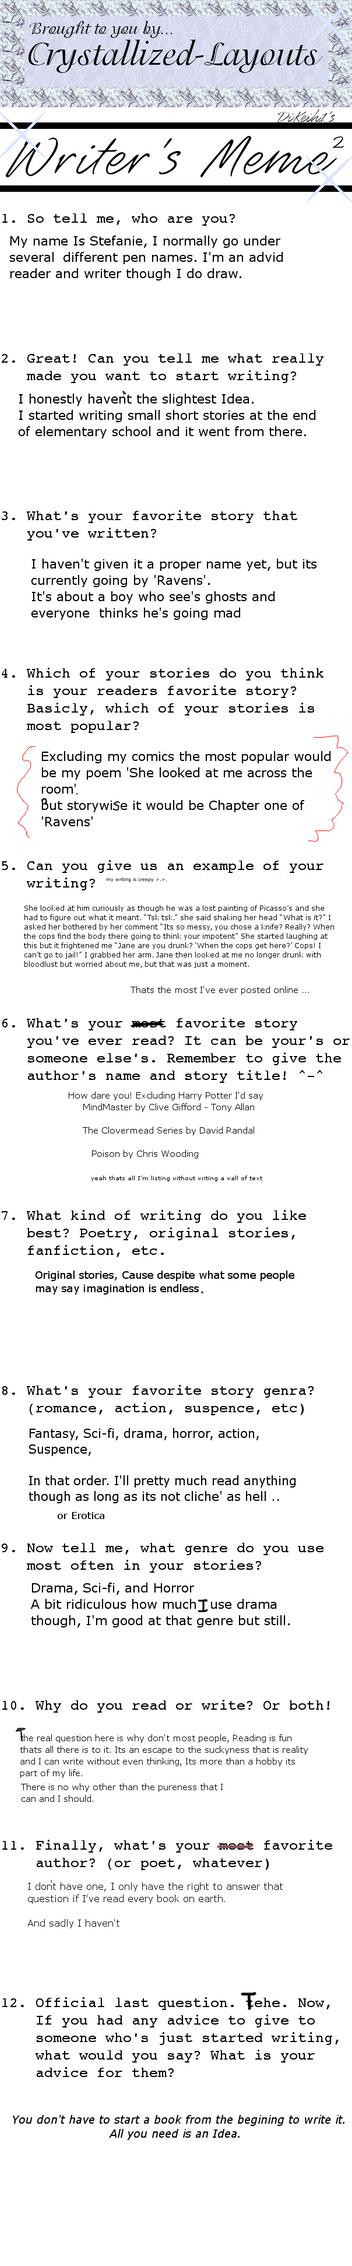 Writers Meme by hinata4312